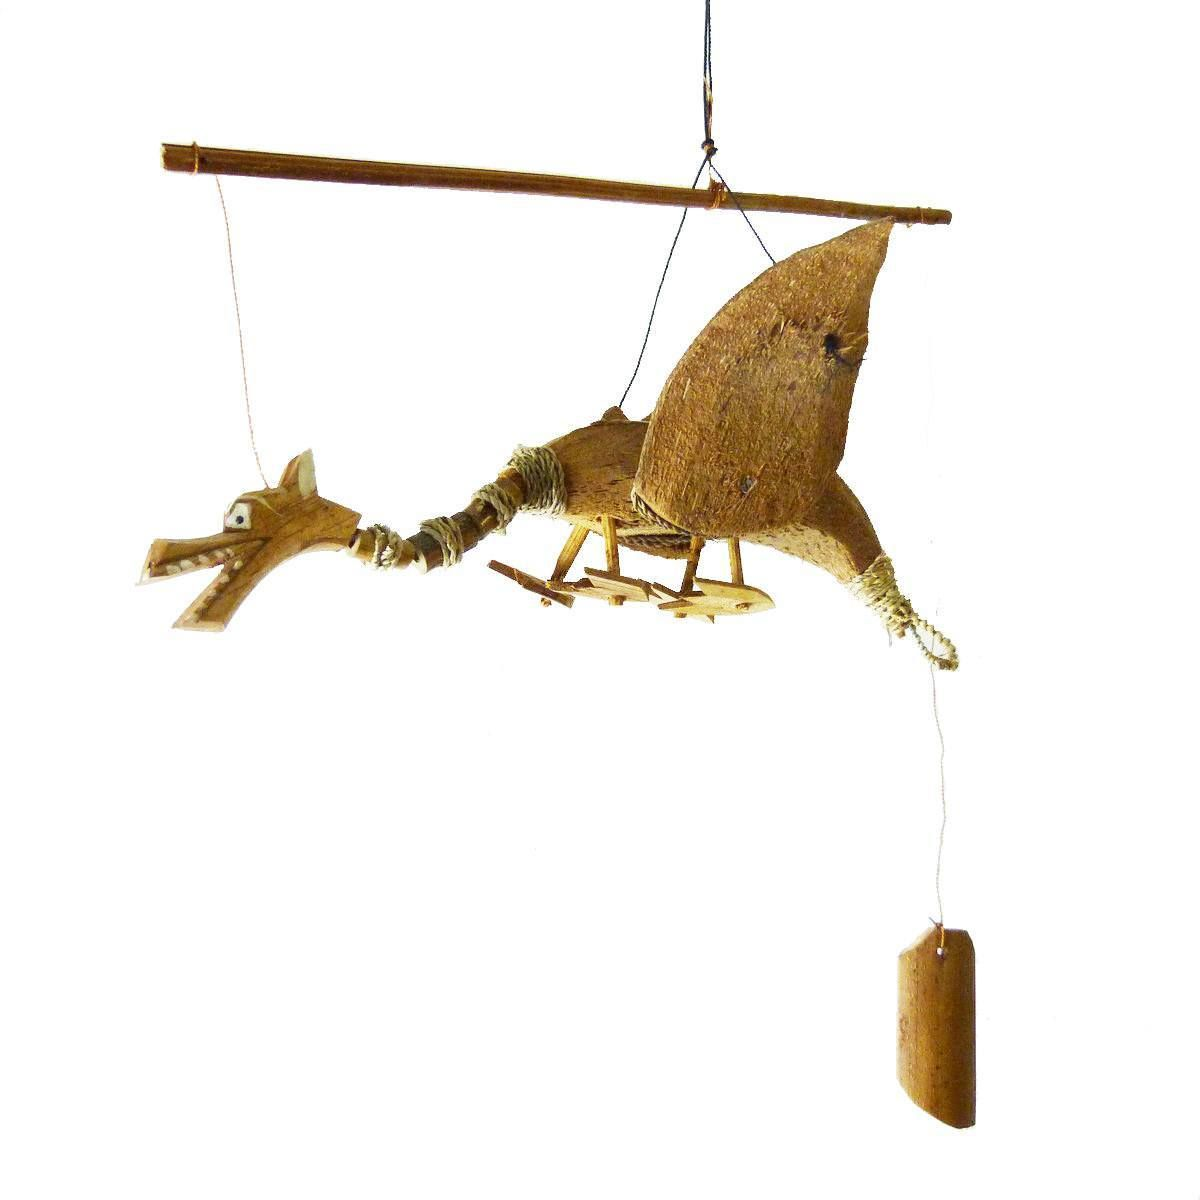 wind chime bamboo coconut wood handmade garten decoration door bell dragon ebay. Black Bedroom Furniture Sets. Home Design Ideas